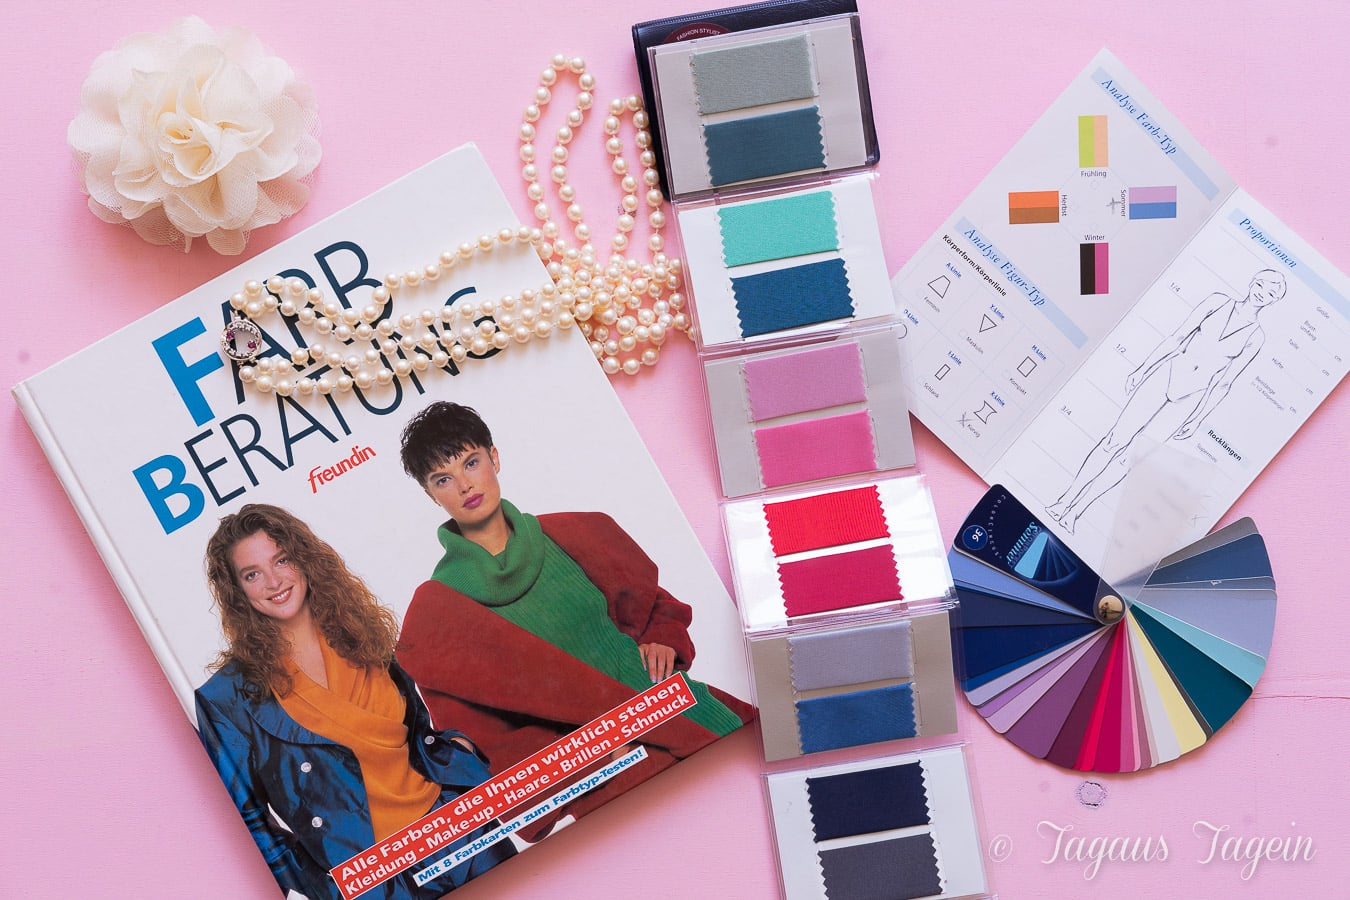 Farb- und Stilberatung für jede Frau – Teil 2